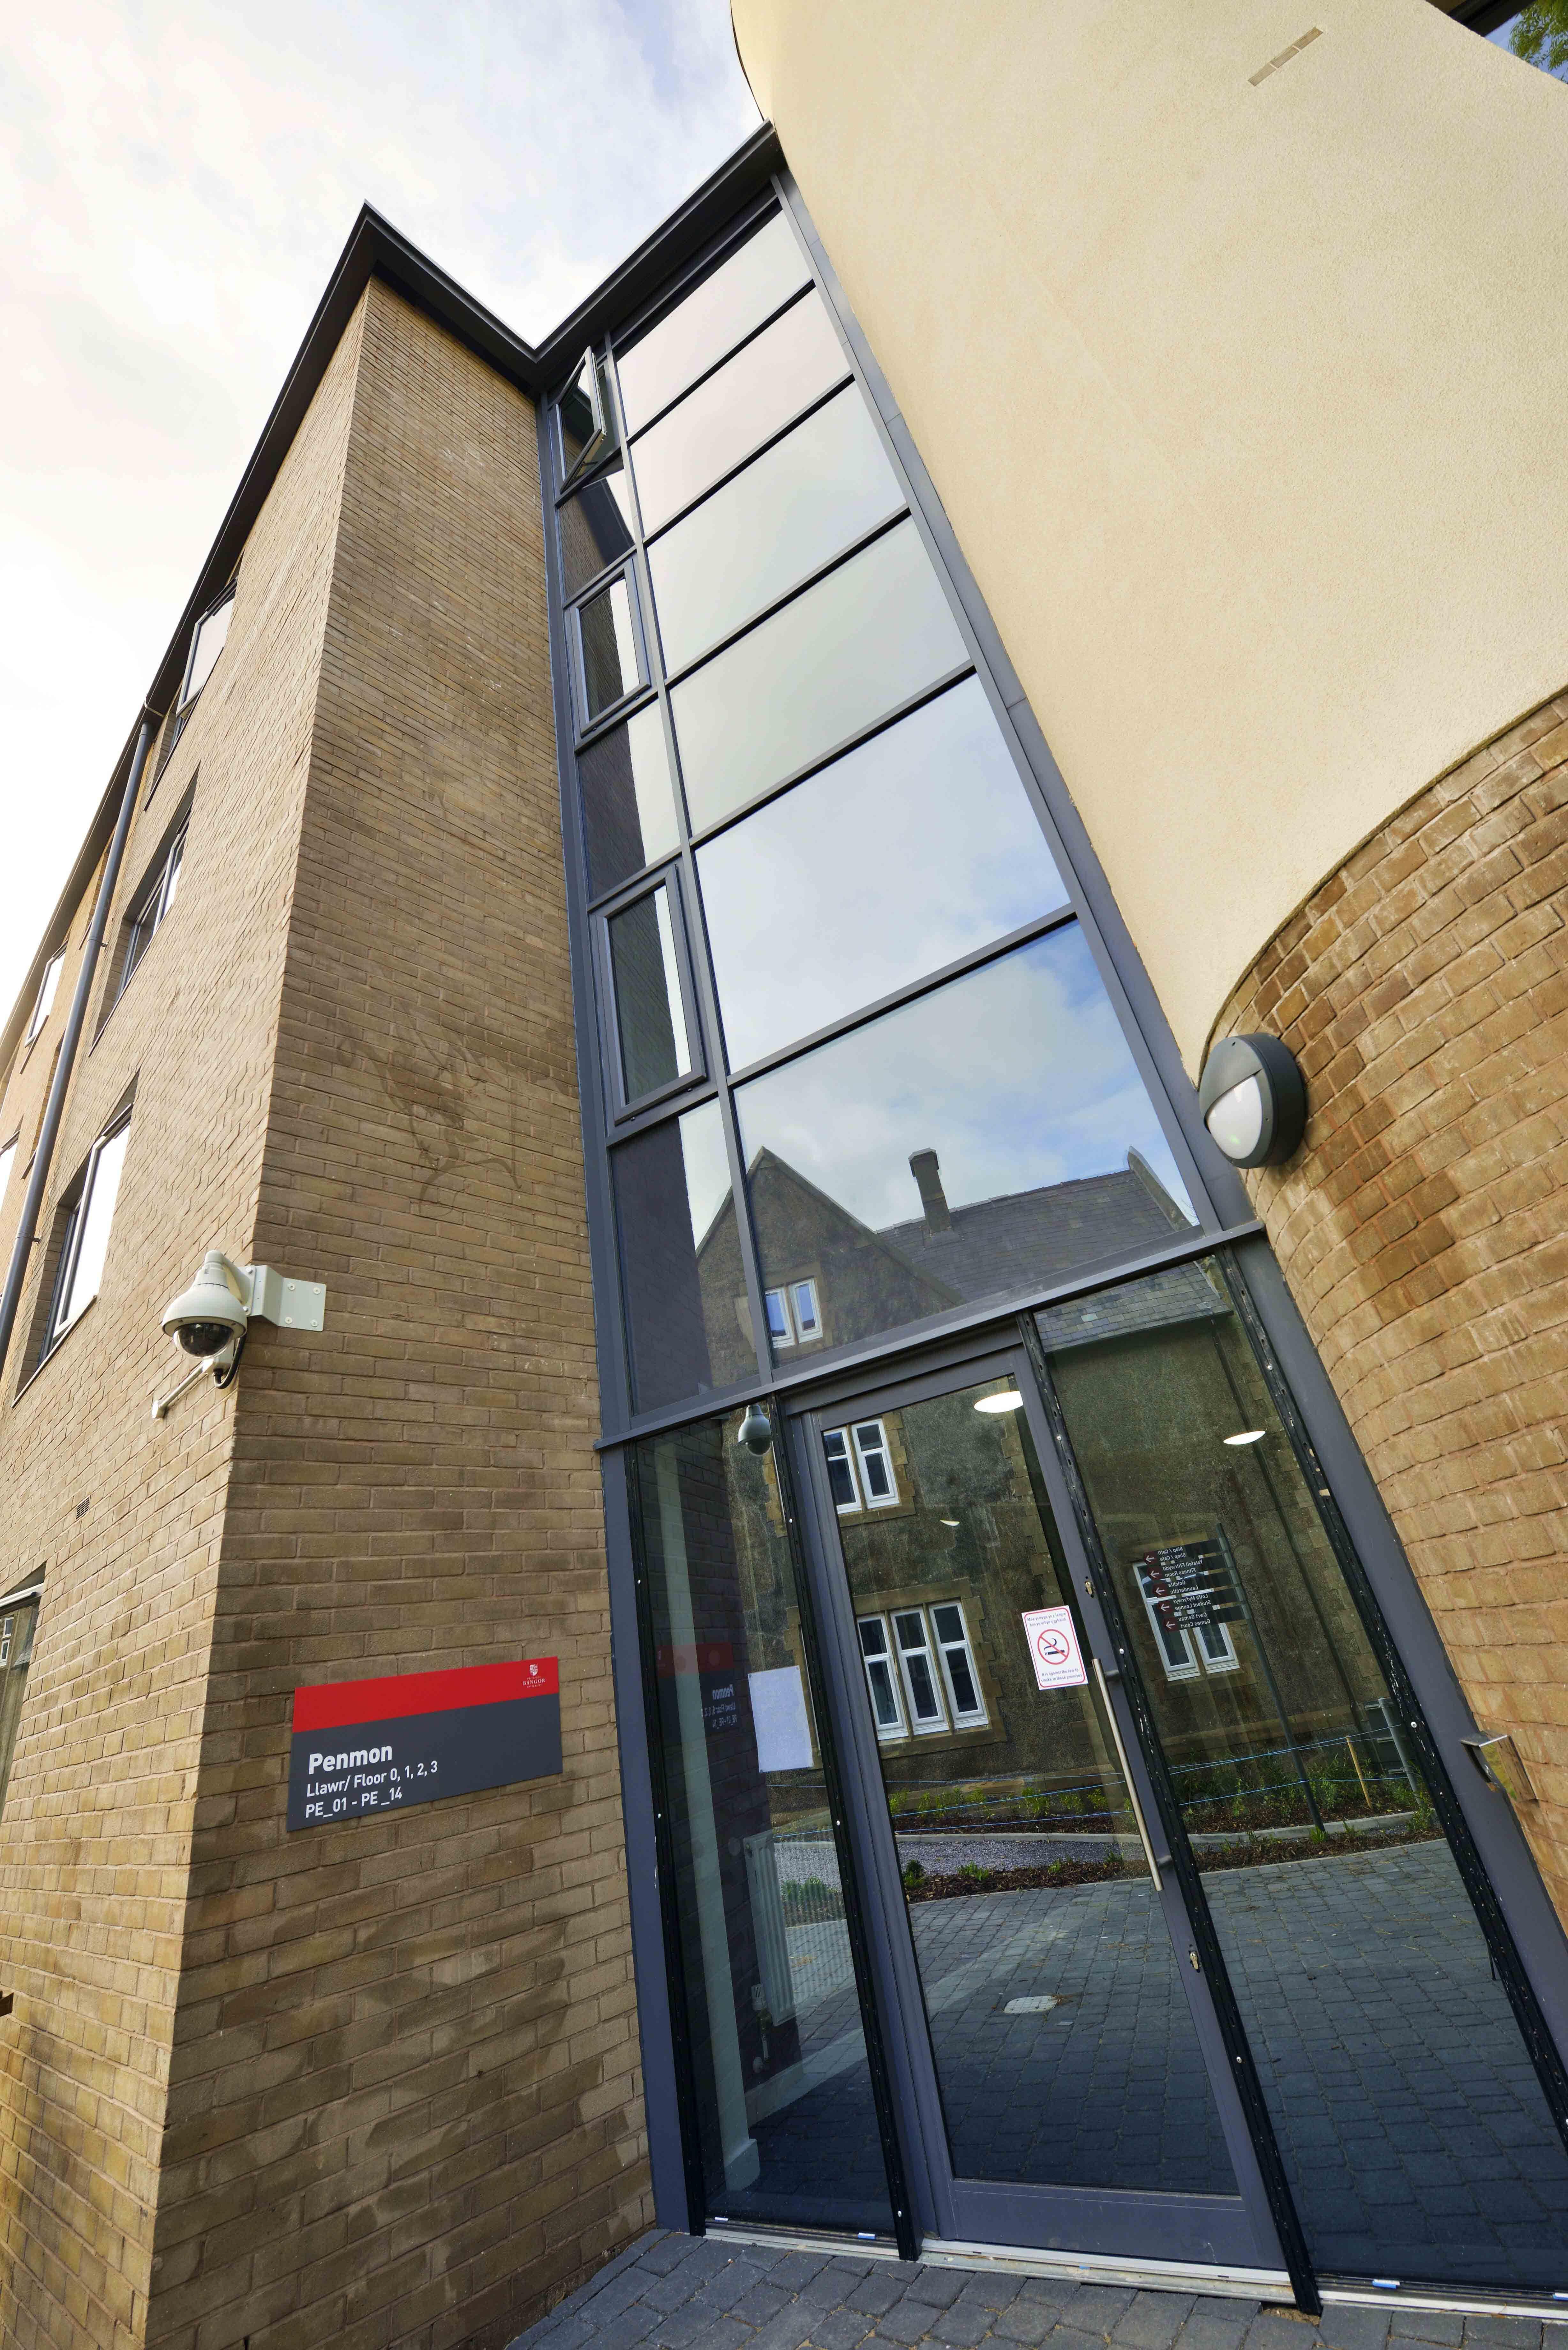 49 Most Popular Modern Dream House Exterior Design Ideas 3 In 2020: A Brilliant REHAU #Polytec50 Installation Done In Bangor University In October 2015